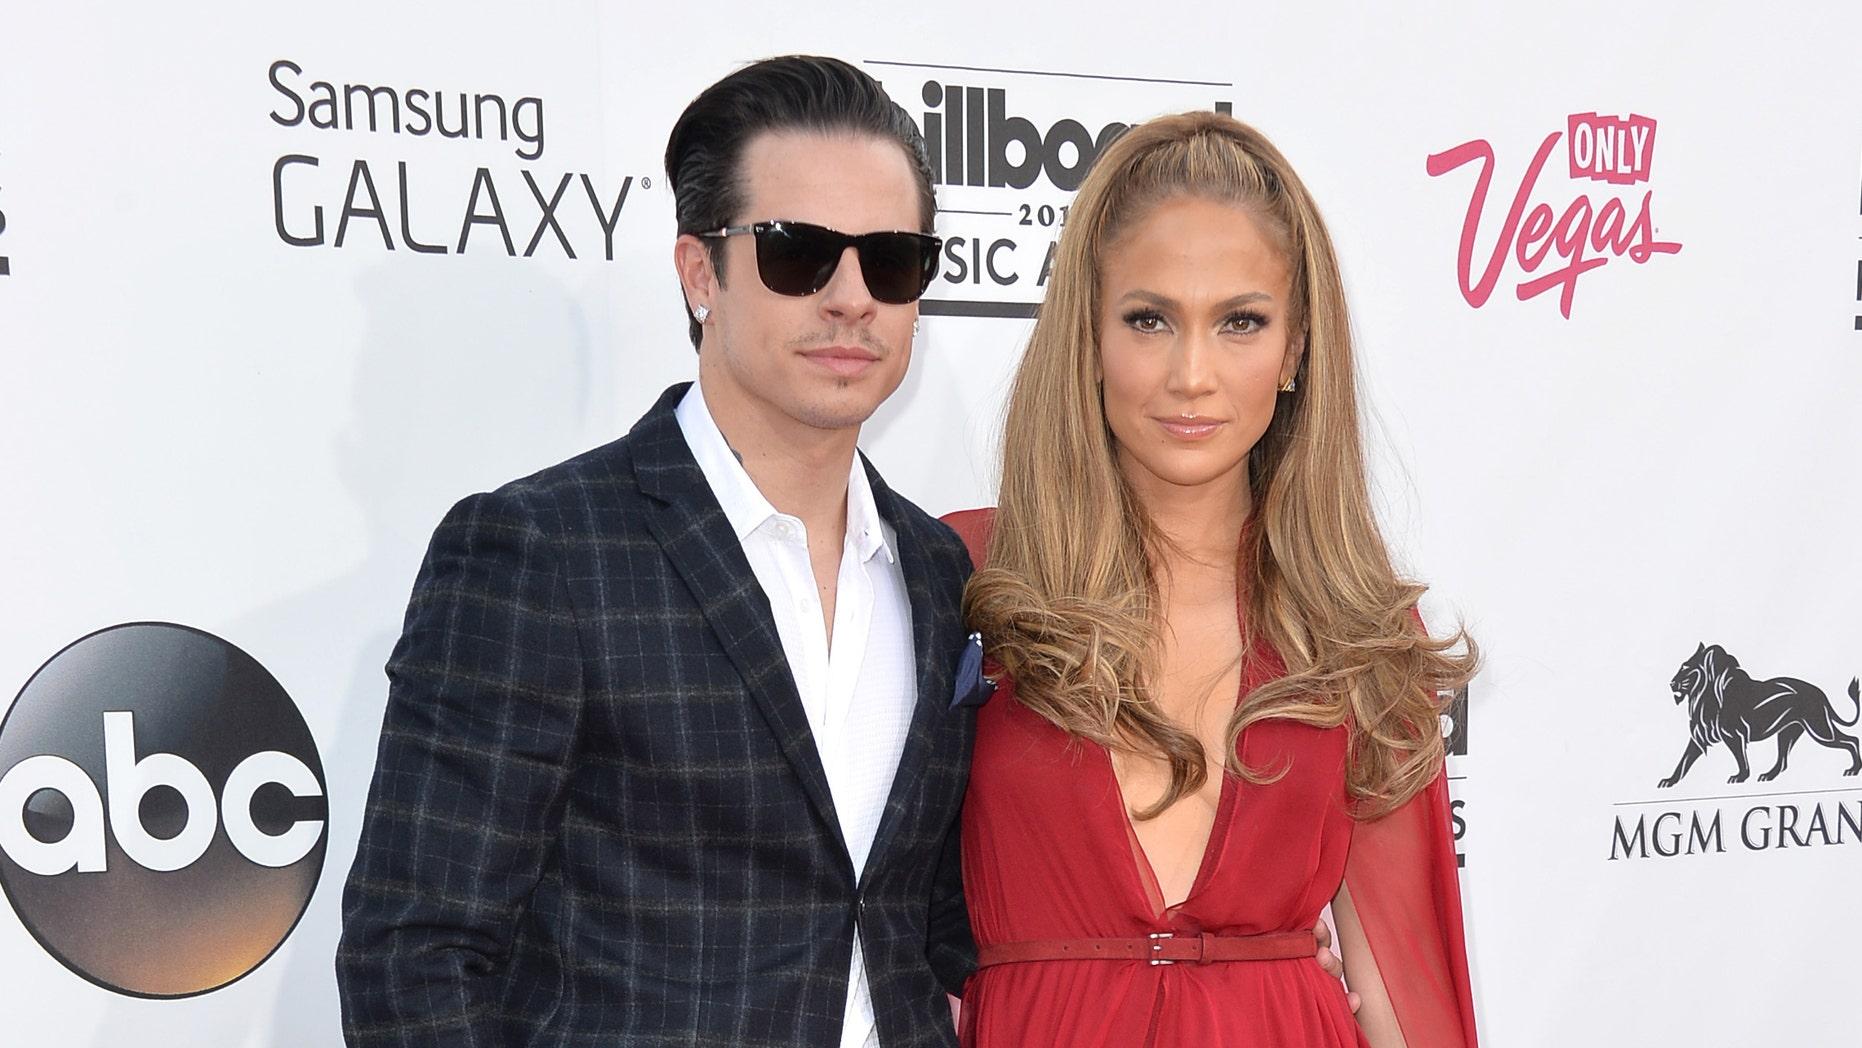 Casper Smart and Jennifer Lopez attend the Billboard Music Awards on May 18, 2014 in Las Vegas, Nevada.